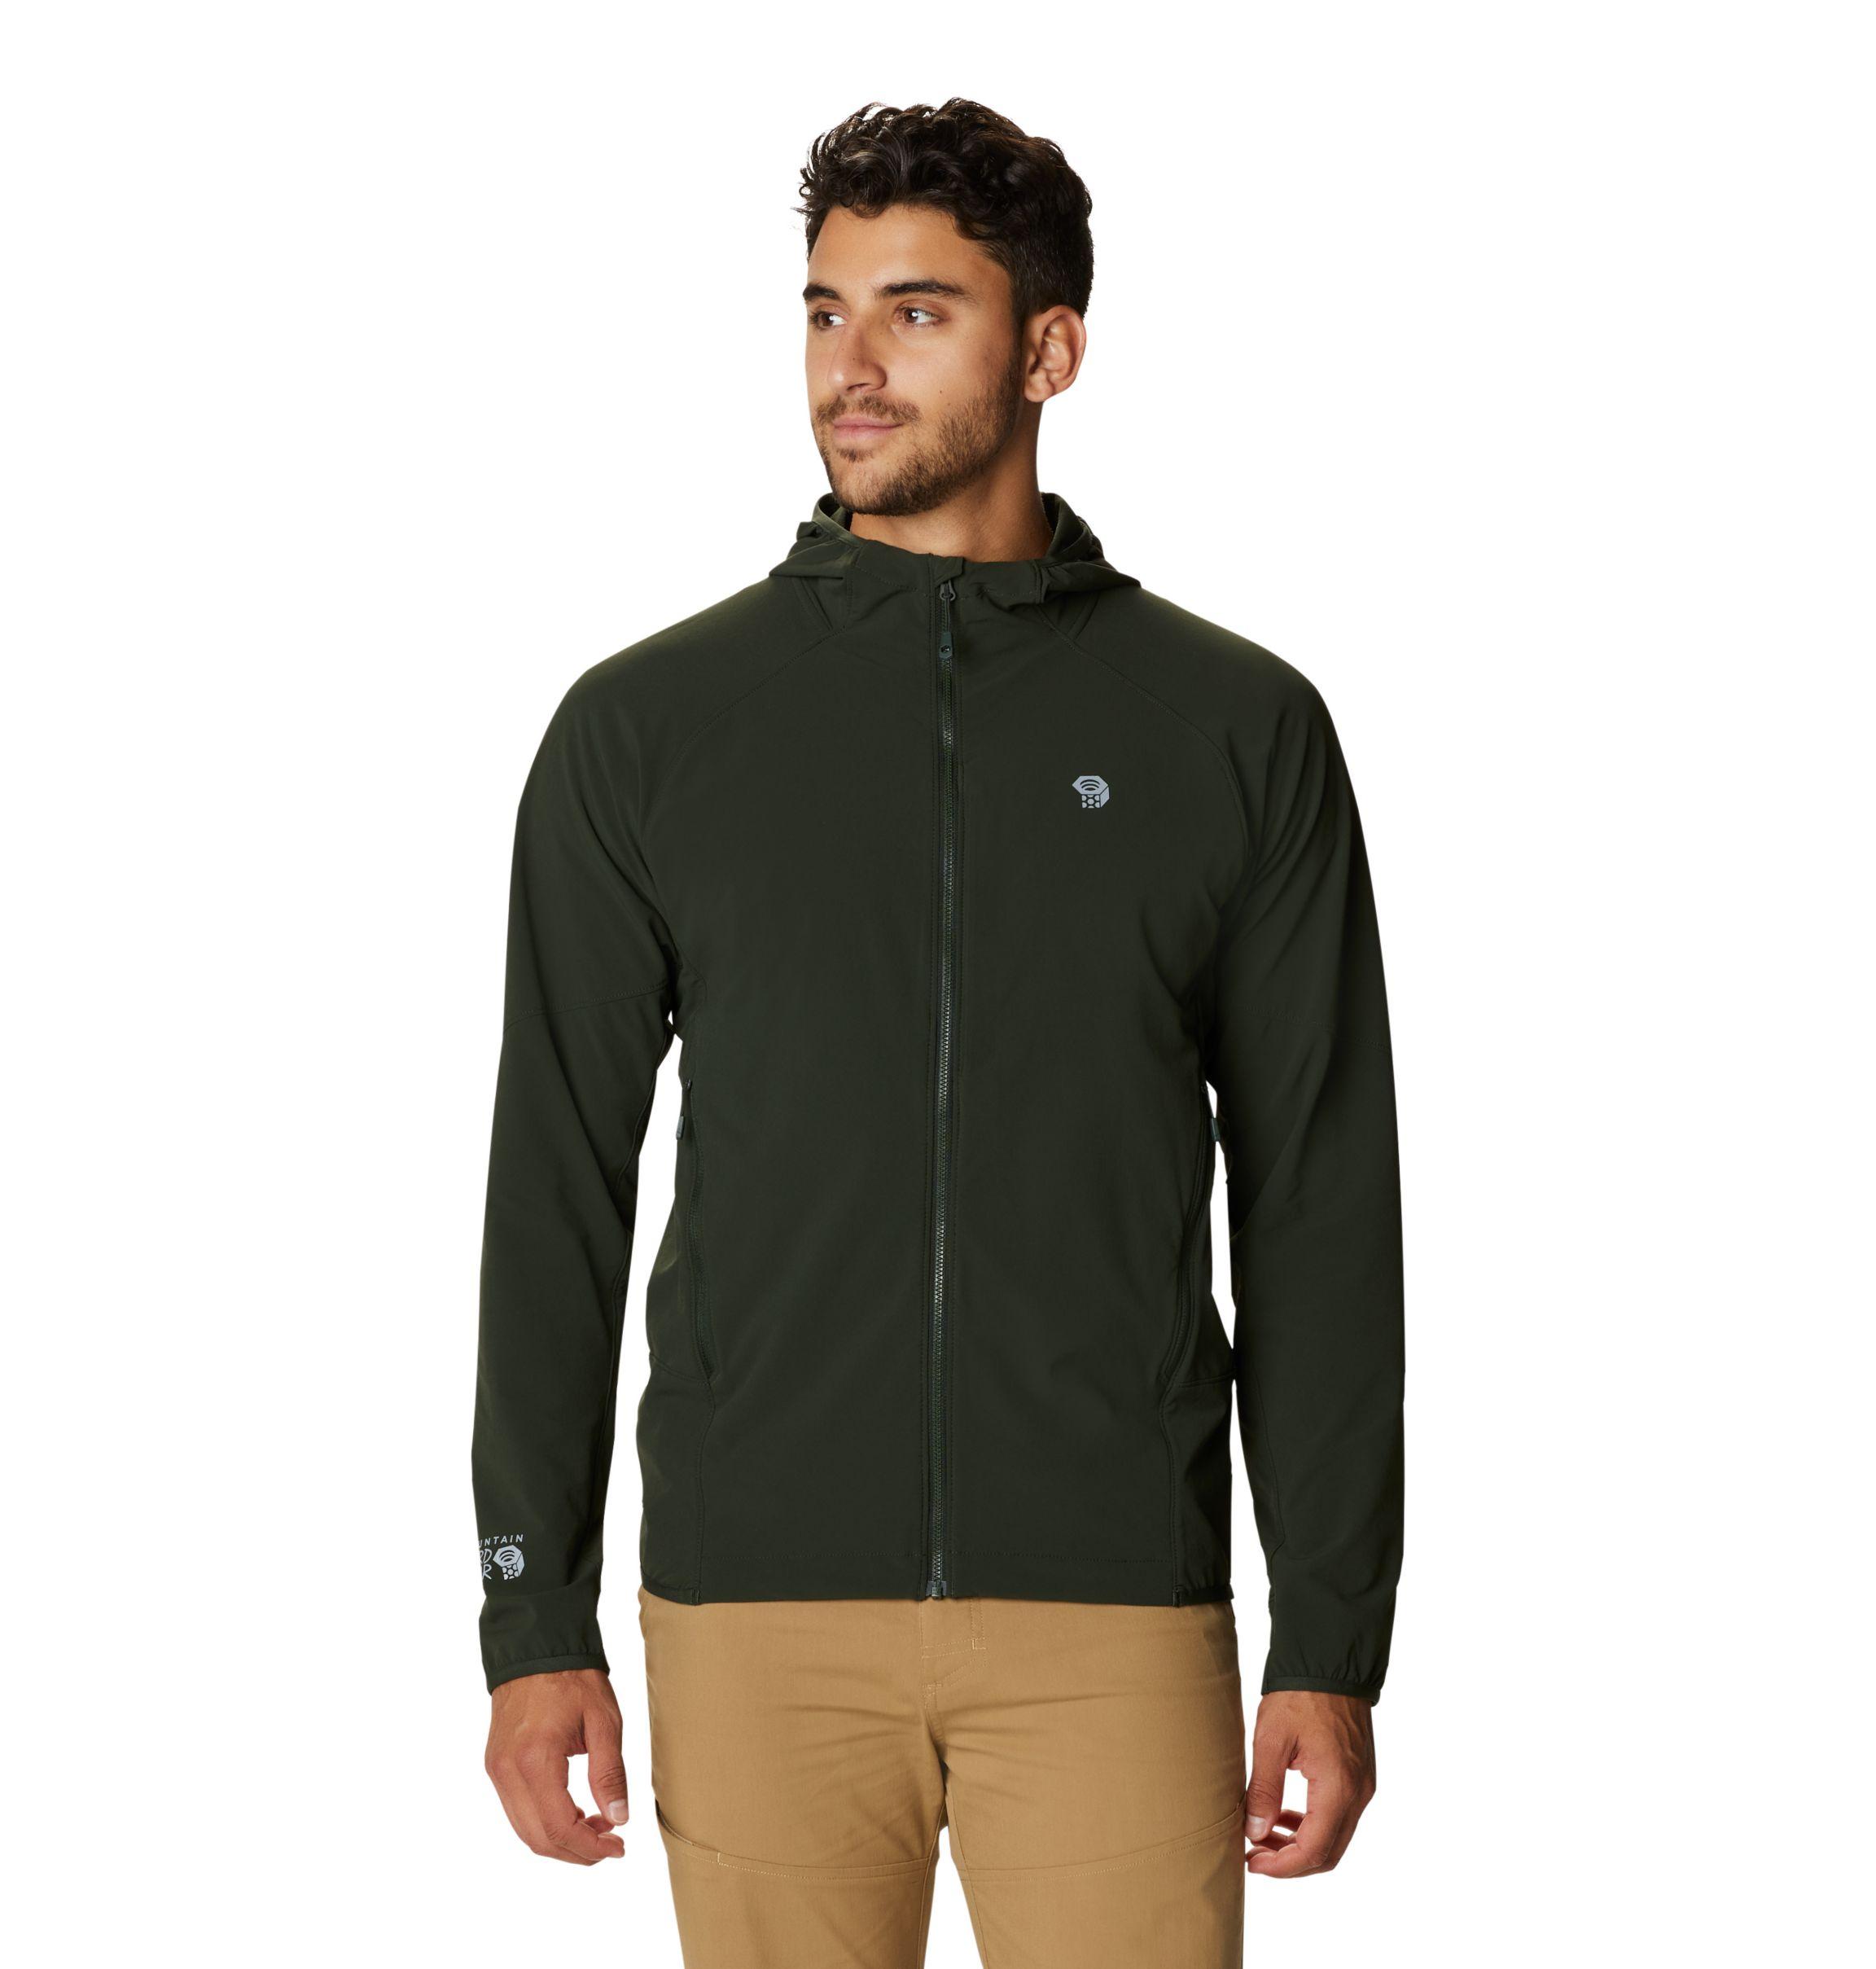 Mountain Hardwear Apparel: Men's Chockstone Full Zip Hoody $53.86, Women's Echo Lake Half Zip Hoody $33.91, More + 2.5% SD Cashback + Free Shipping